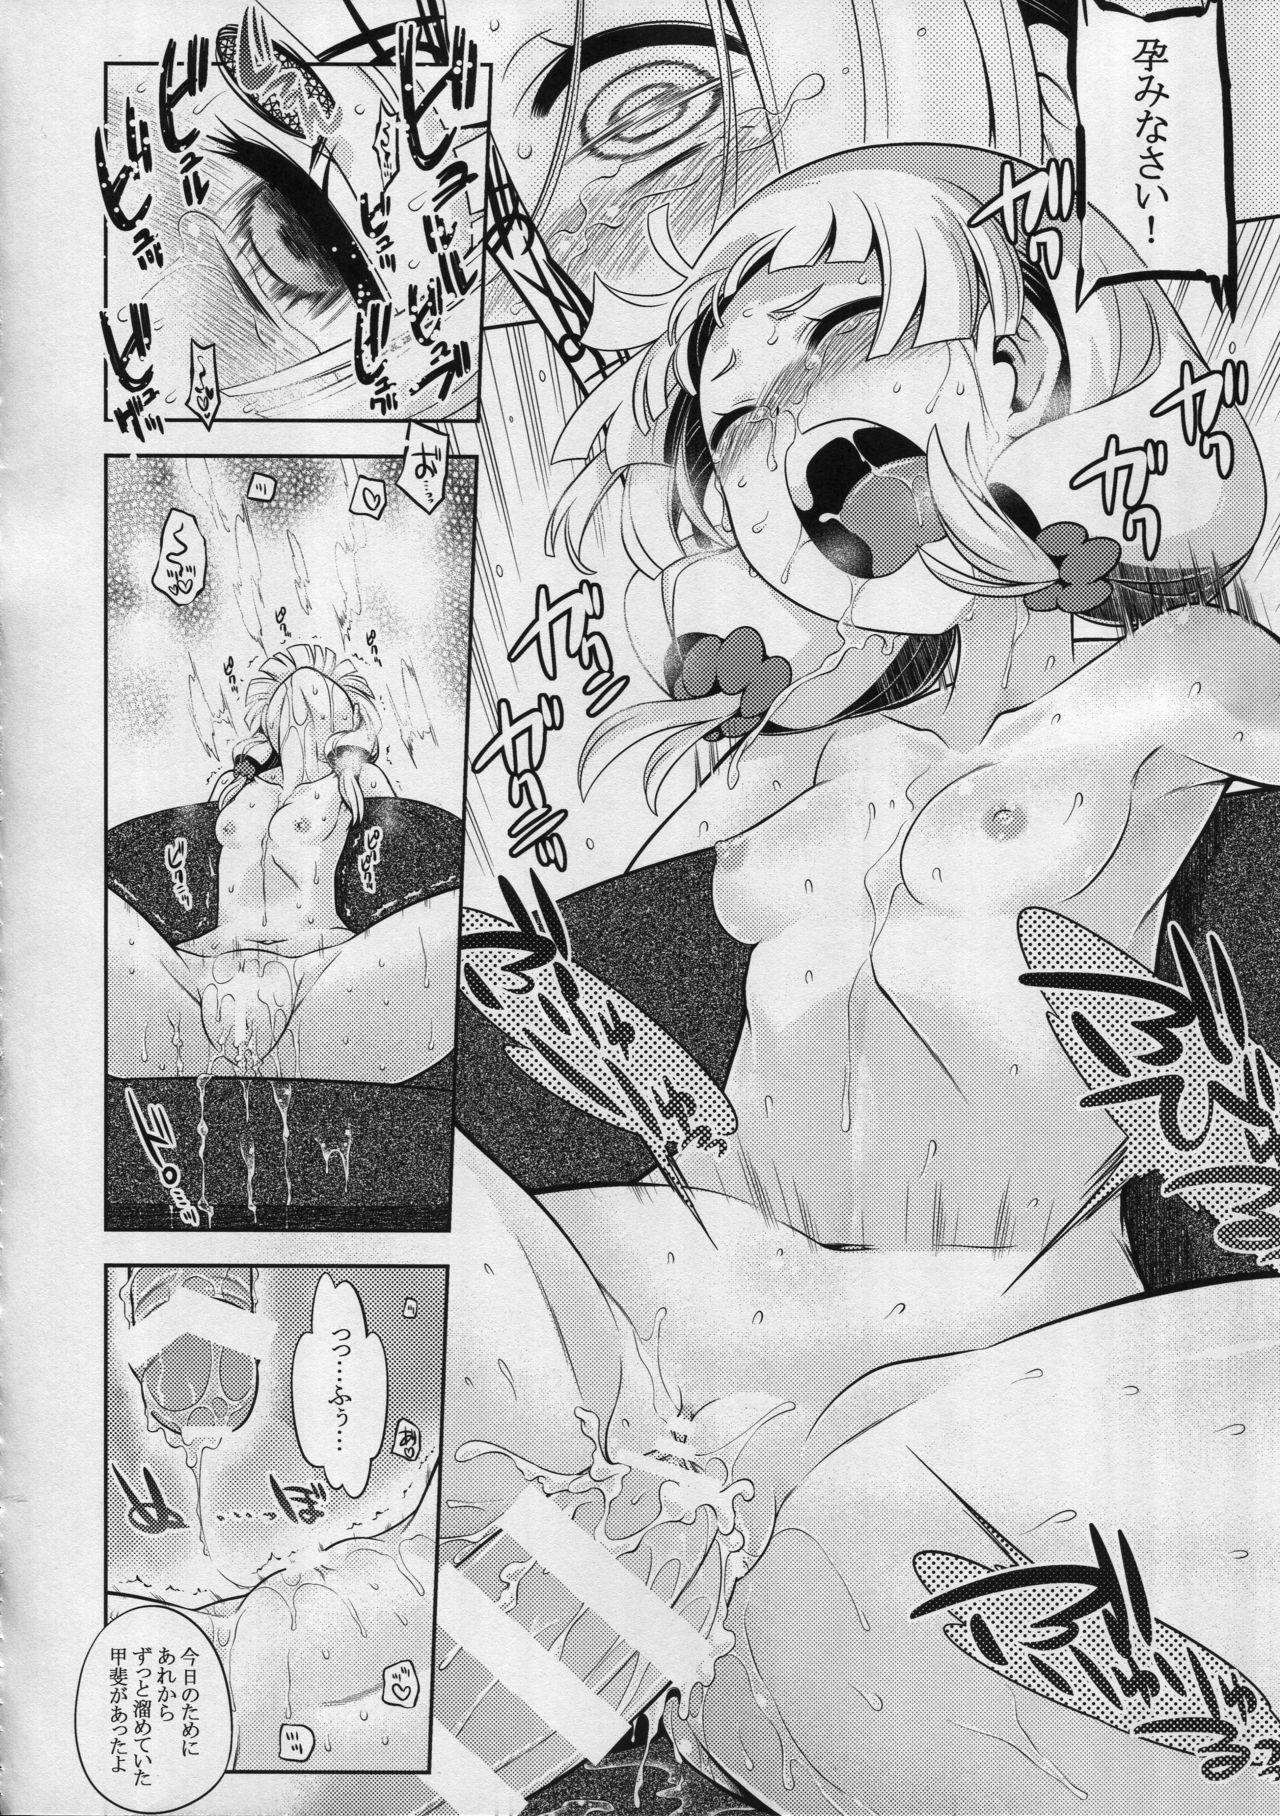 Sekaiju no Anone 28 Kouhen 23